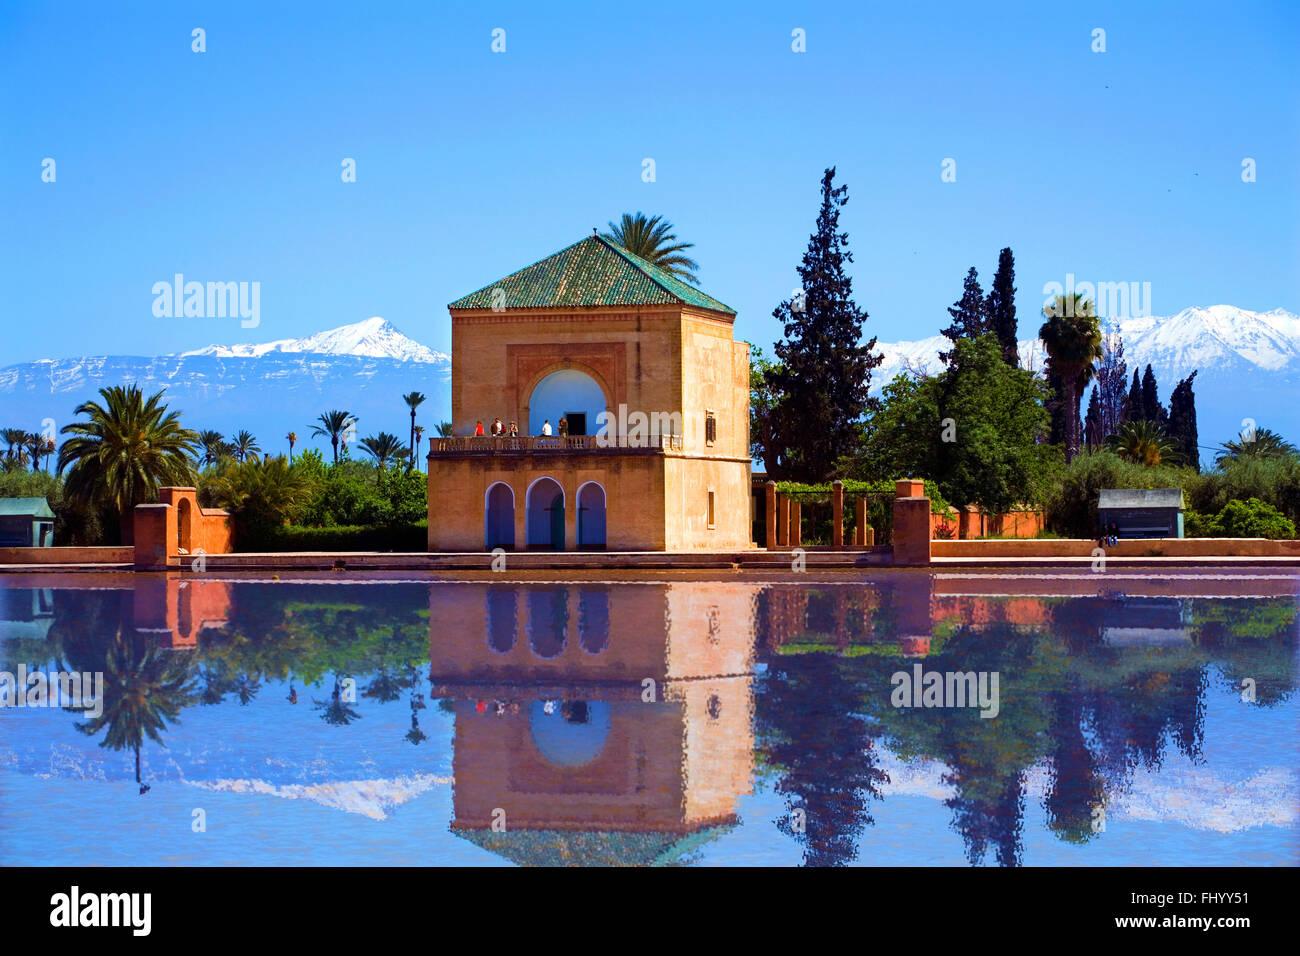 The beautiful La Menara in Marrakech Morocco. - Stock Image